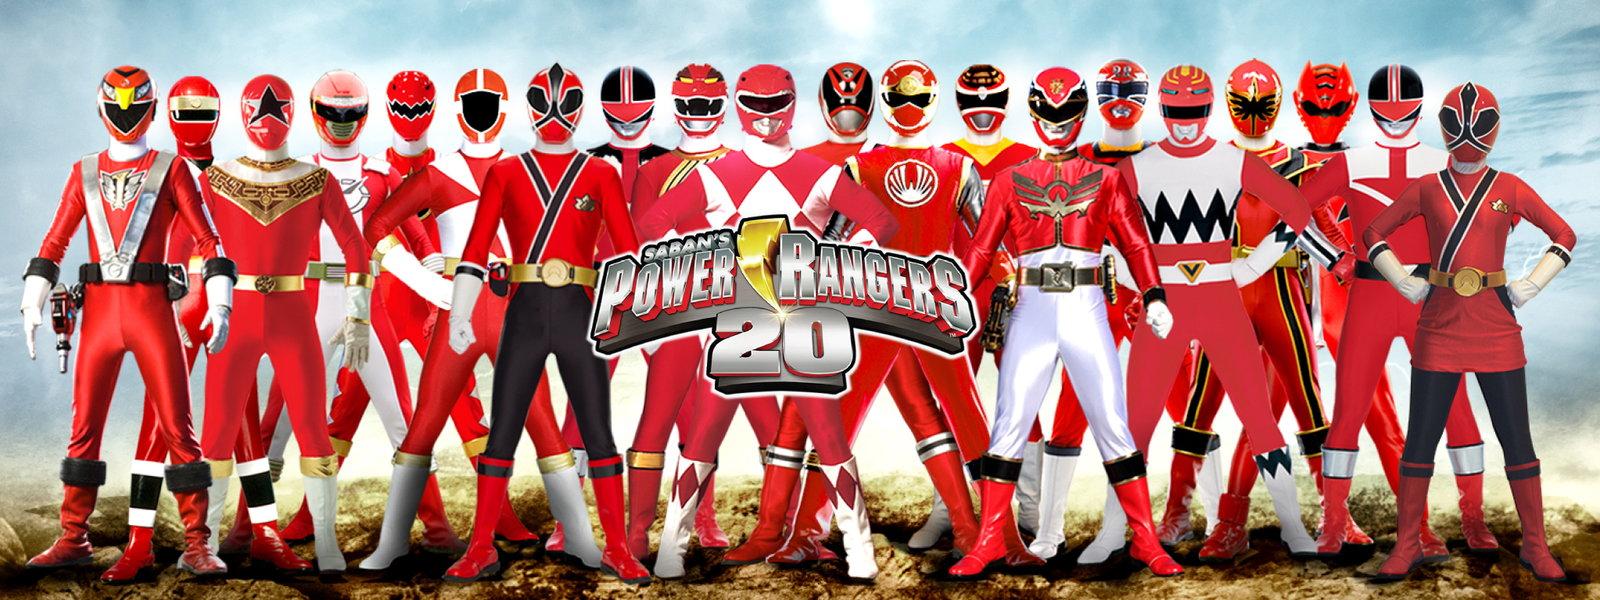 immagini power rangers rpm